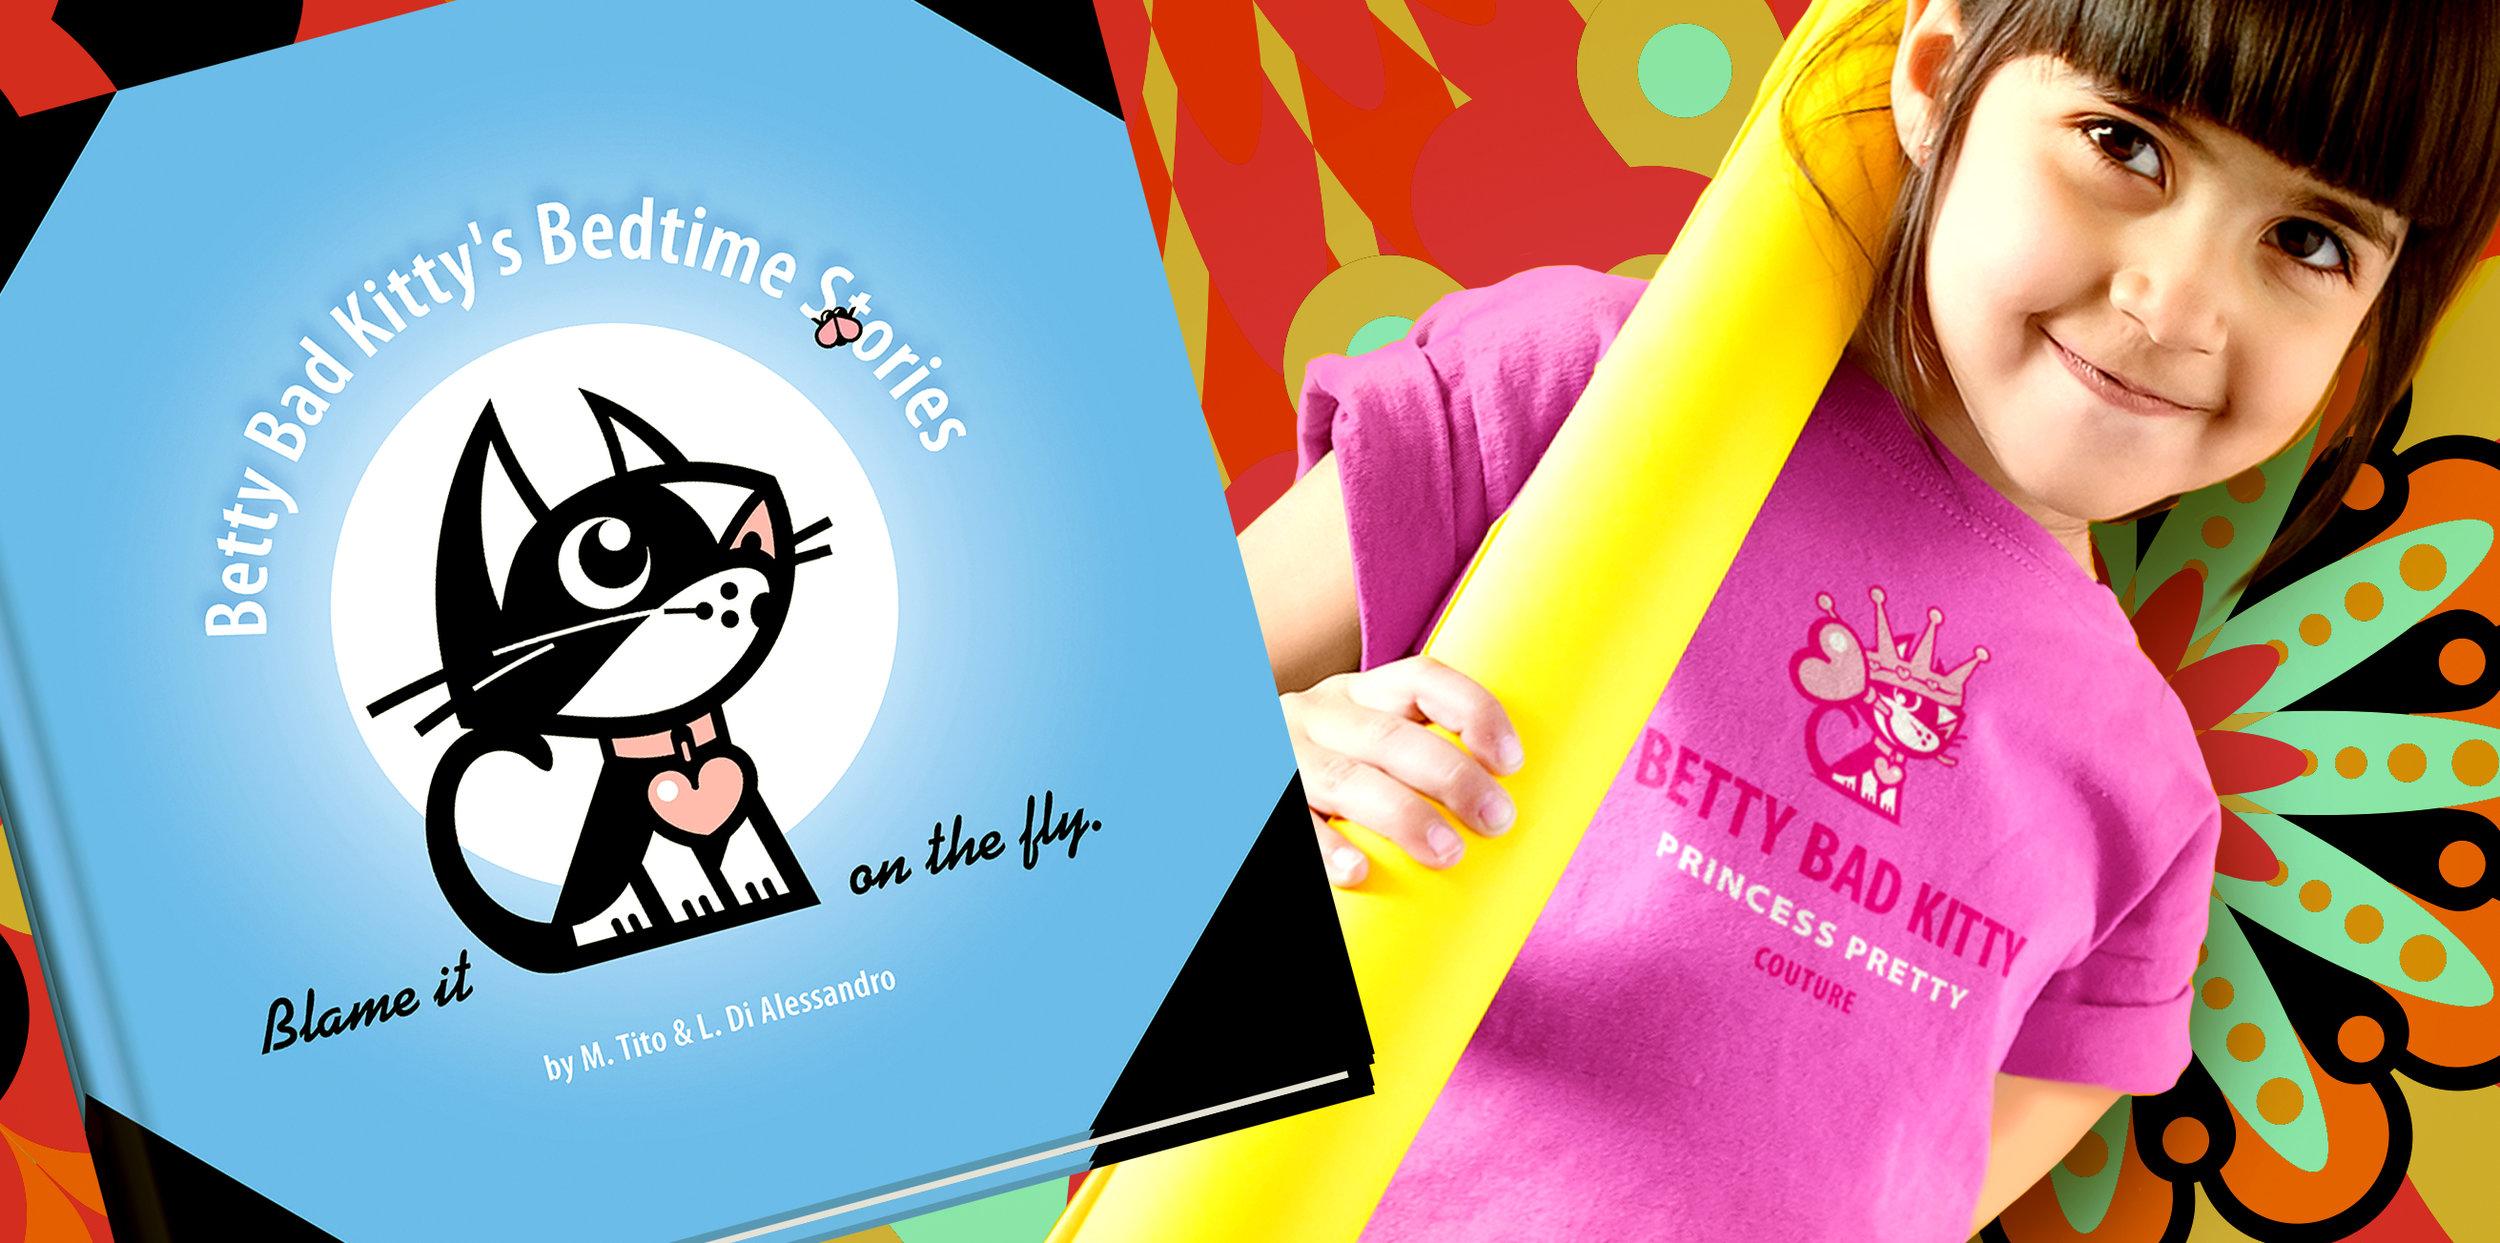 Kitty-Bedtime-Stories copy.jpg